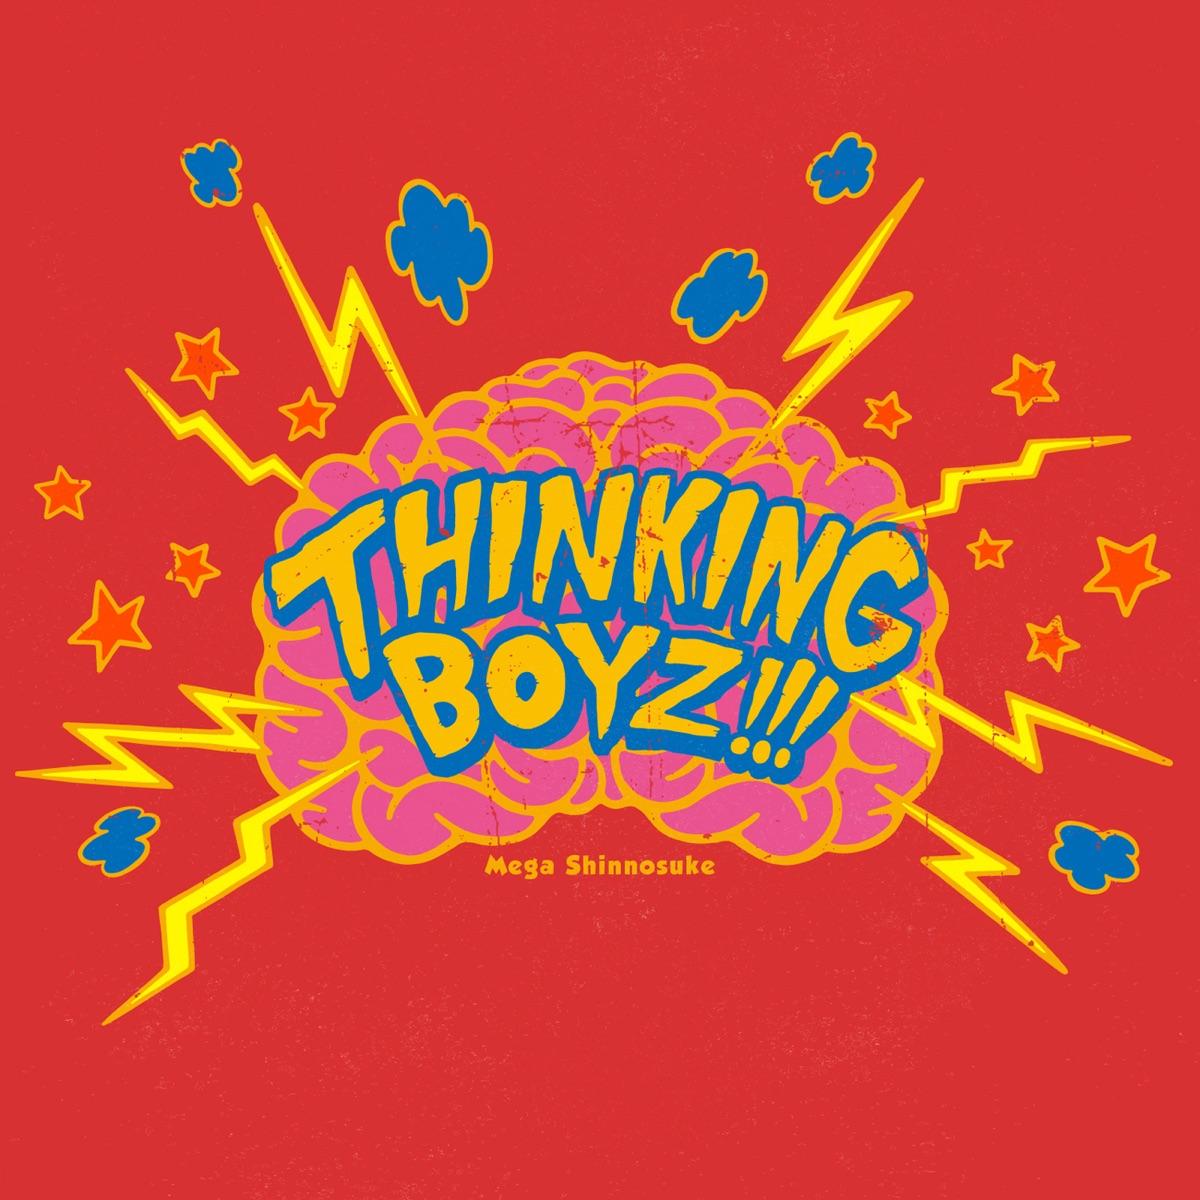 『Mega Shinnosuke - Thinking Boyz!!!』収録の『Thinking Boyz!!!』ジャケット